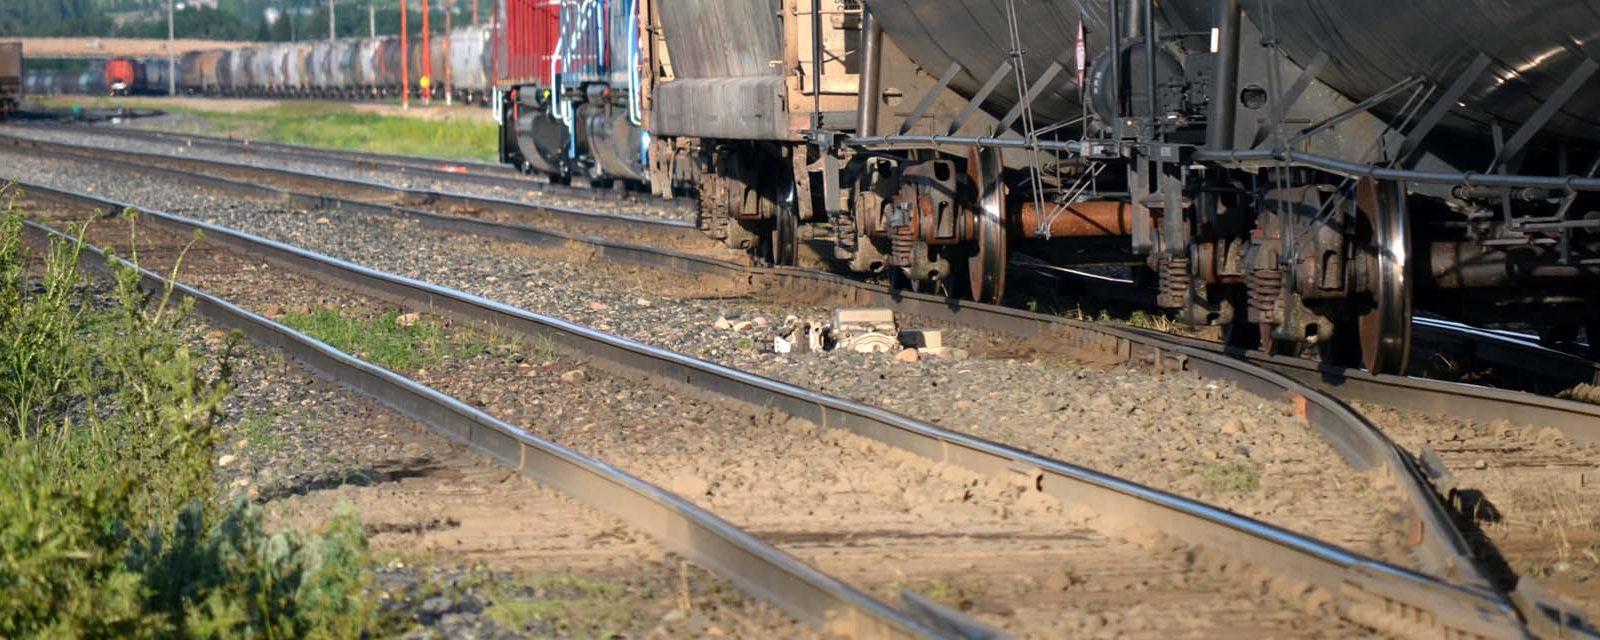 Great Sandhills Railway tracks